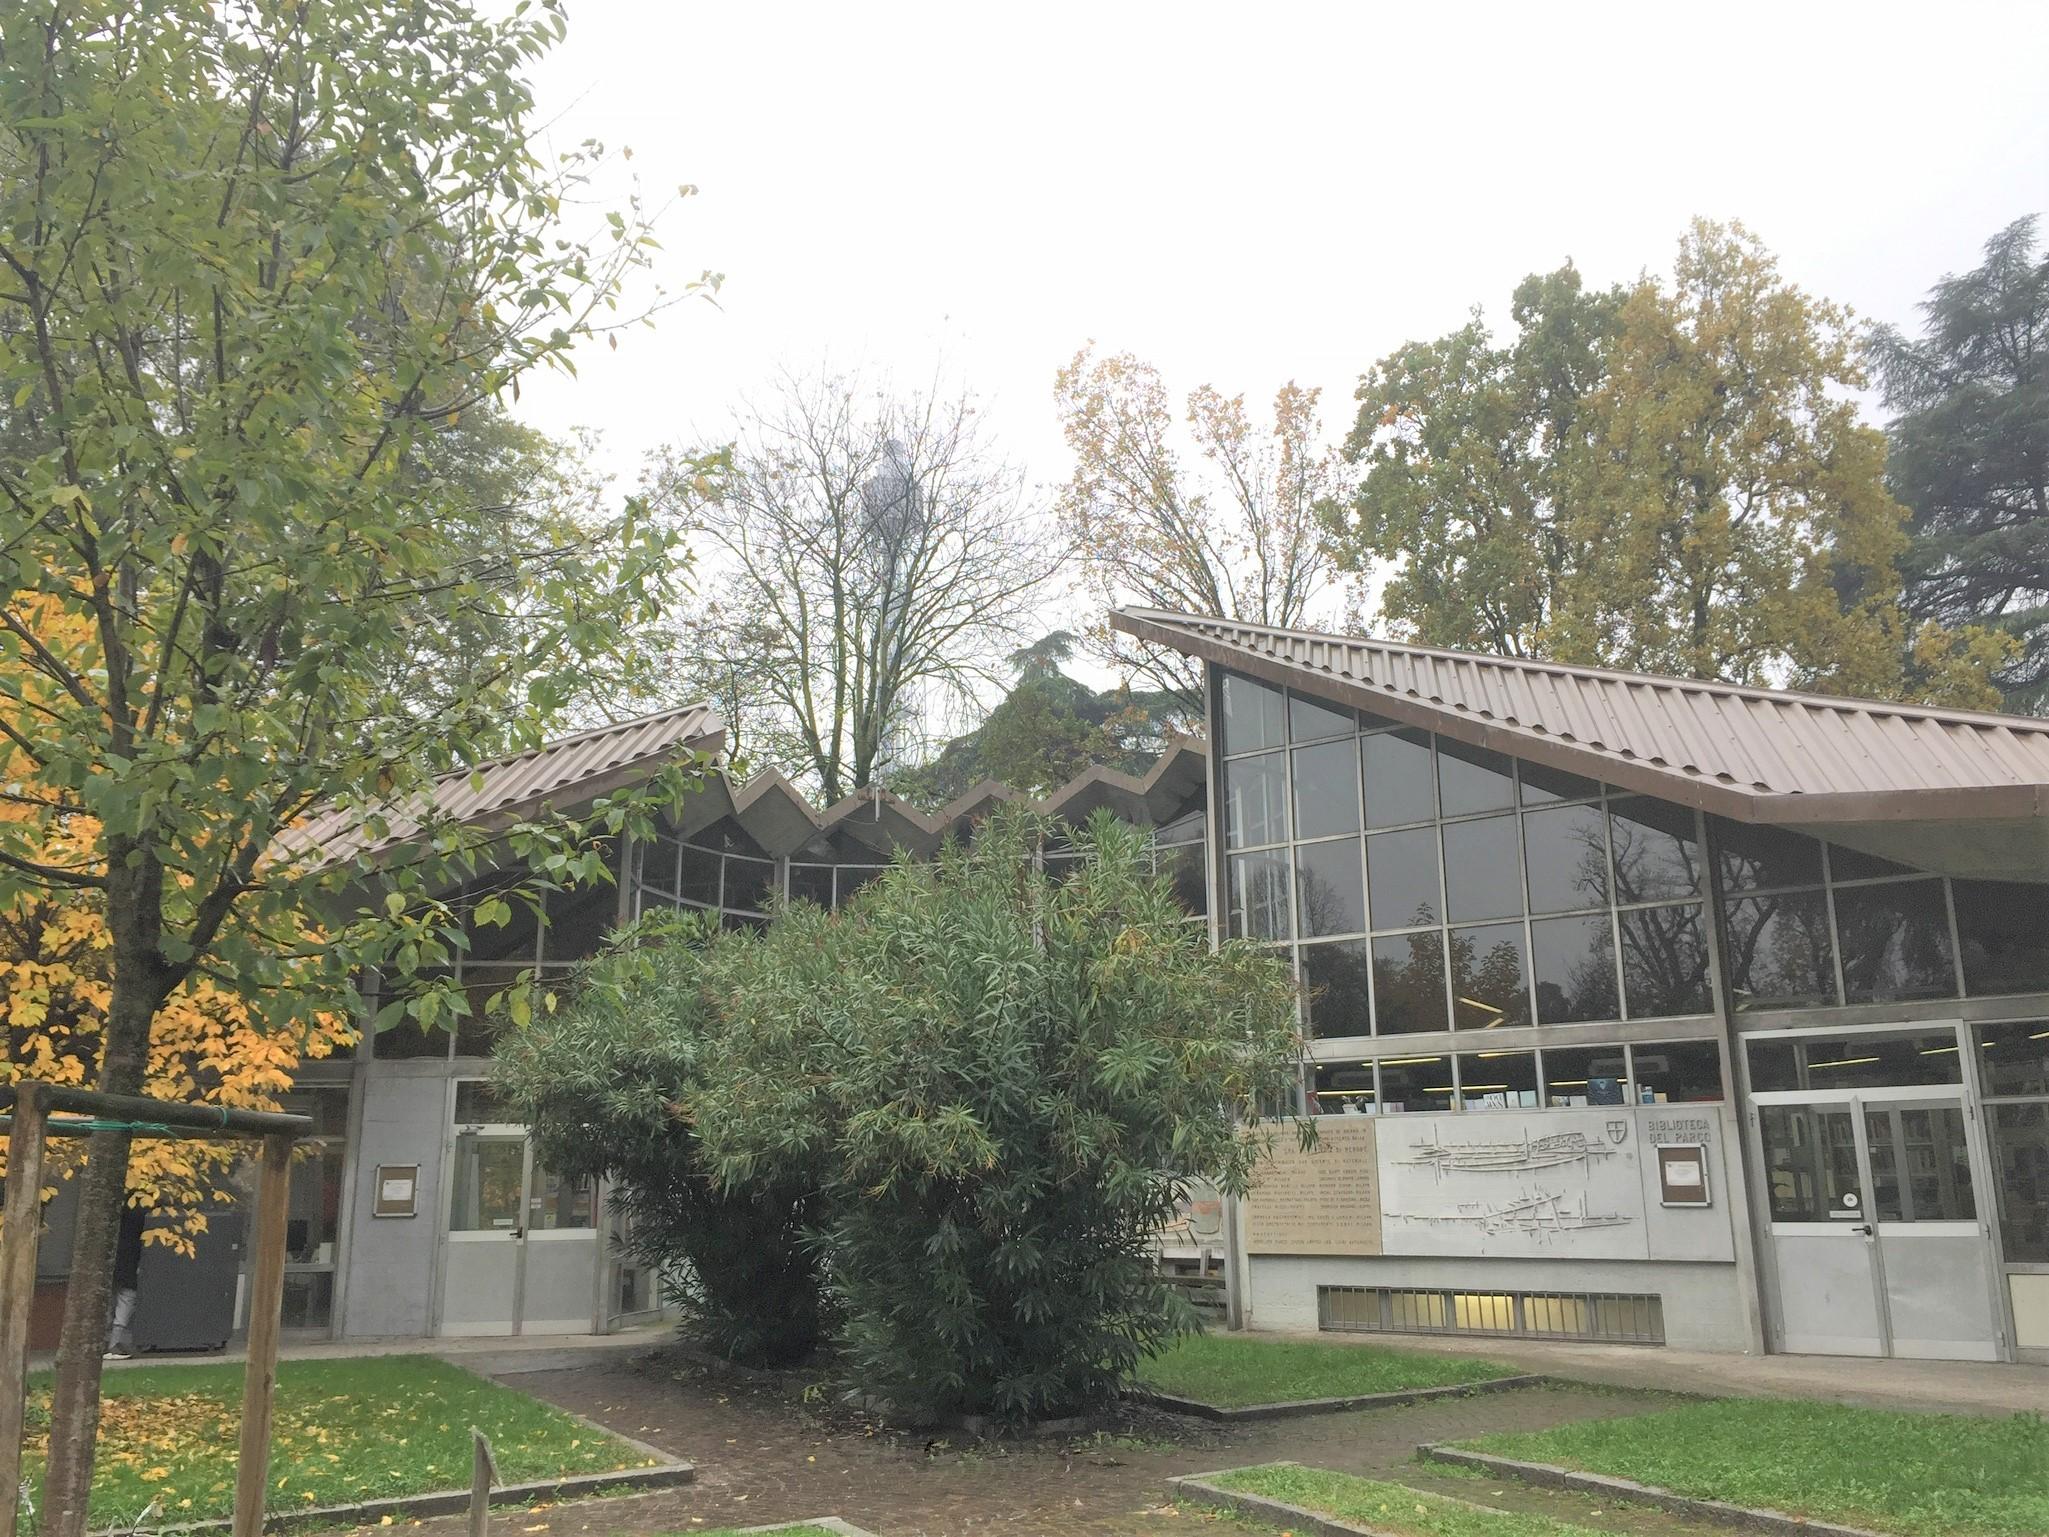 La biblioteca rionale del Parco Sempione